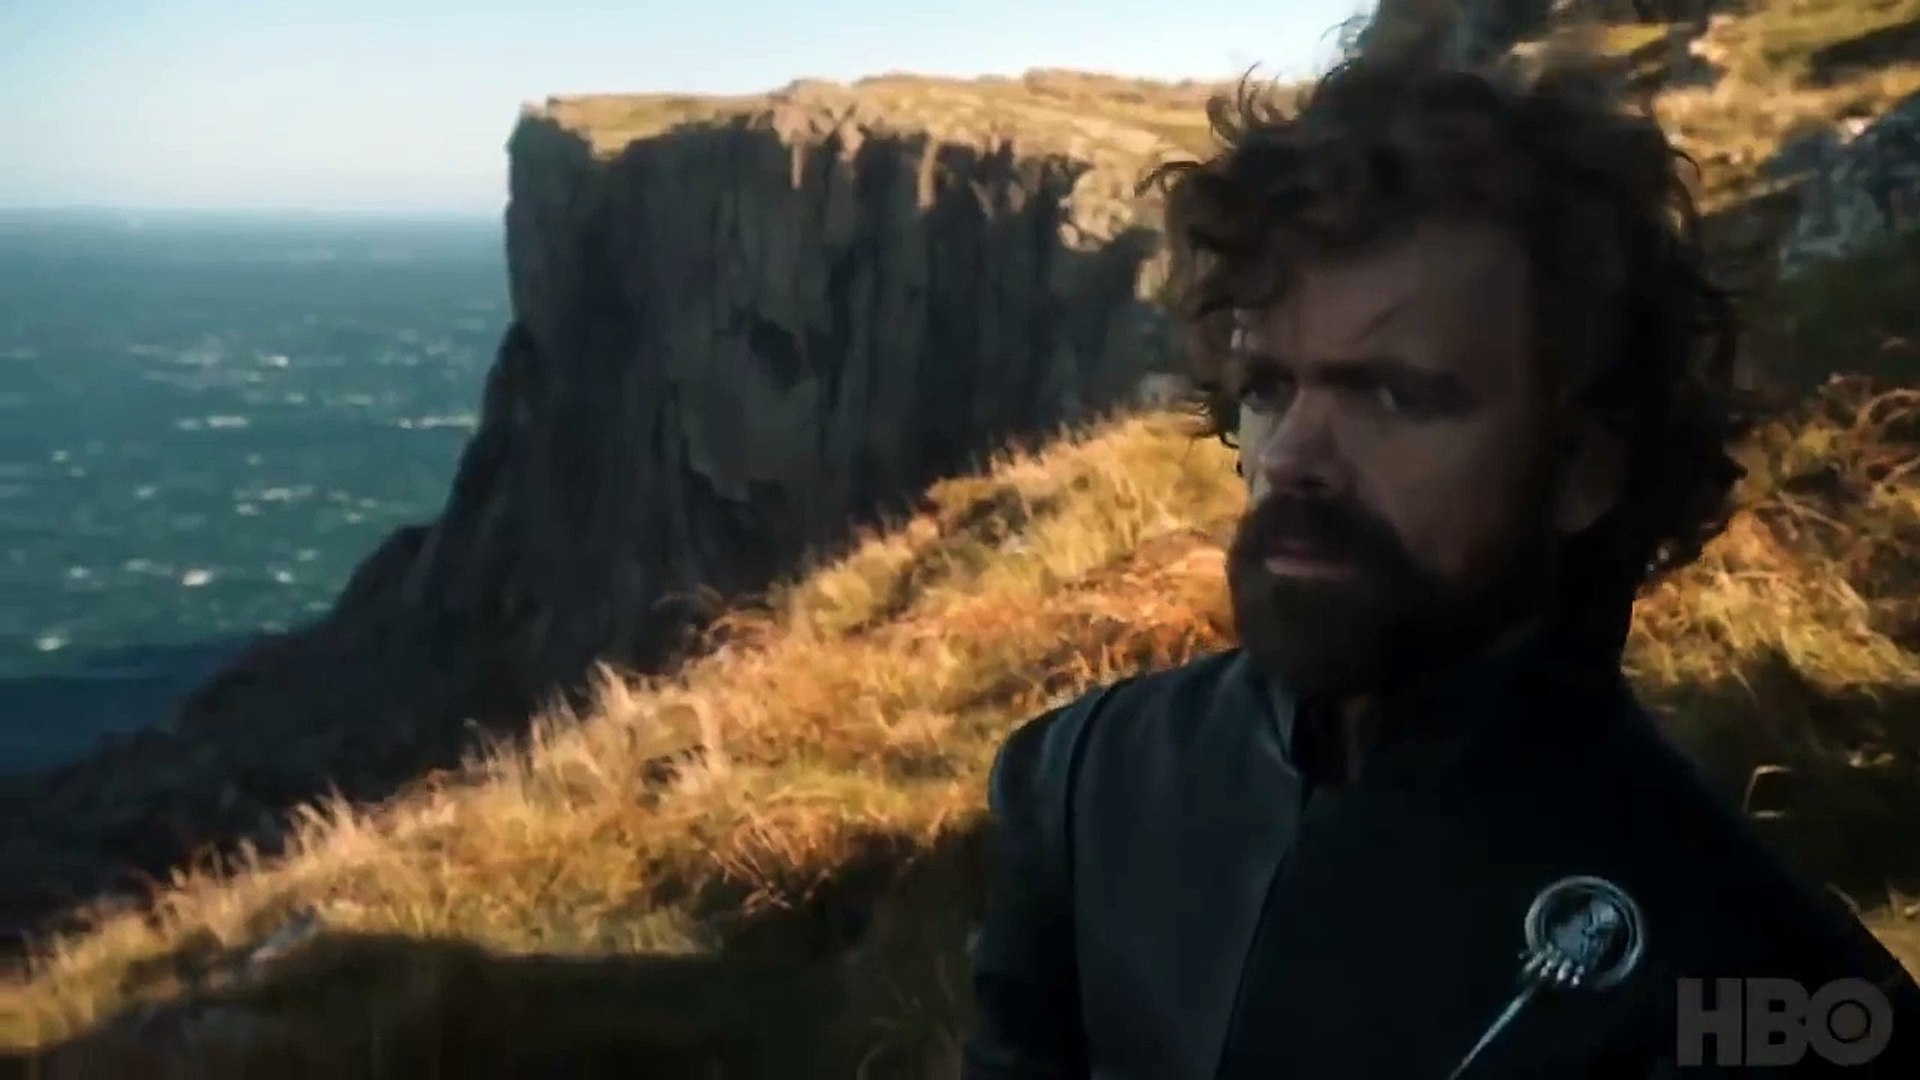 Game of Thrones Season 7 Trailer #2 (2017) - TV Trailer - Movie Trailers